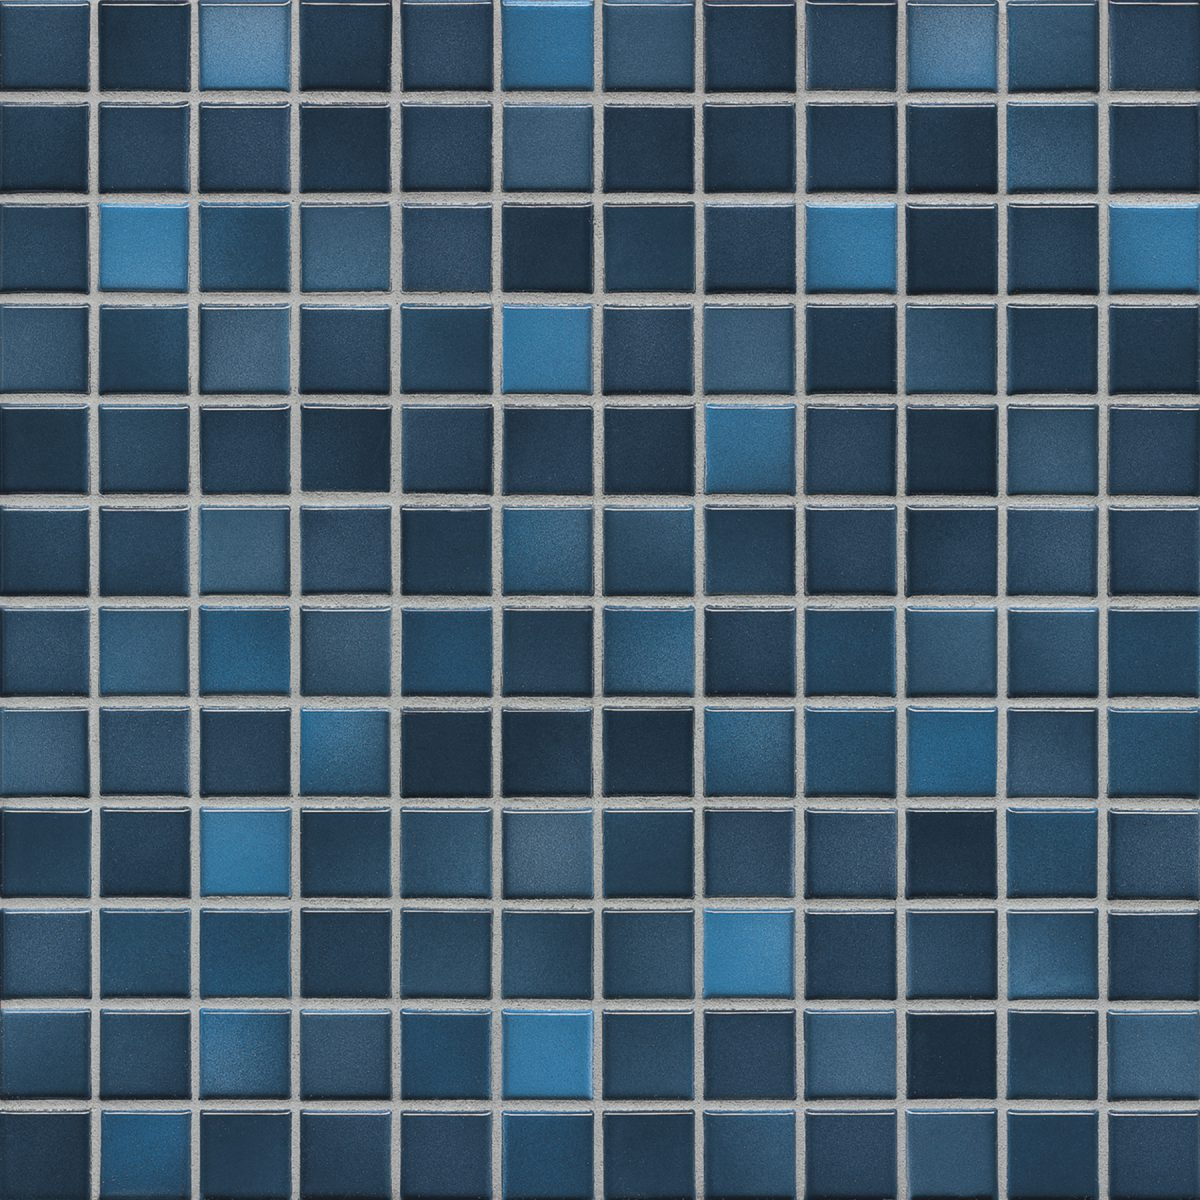 Мозаика серия Fresh 2,4 X 2,4 см Midnight Blue Mix Glossy (глазурованная)